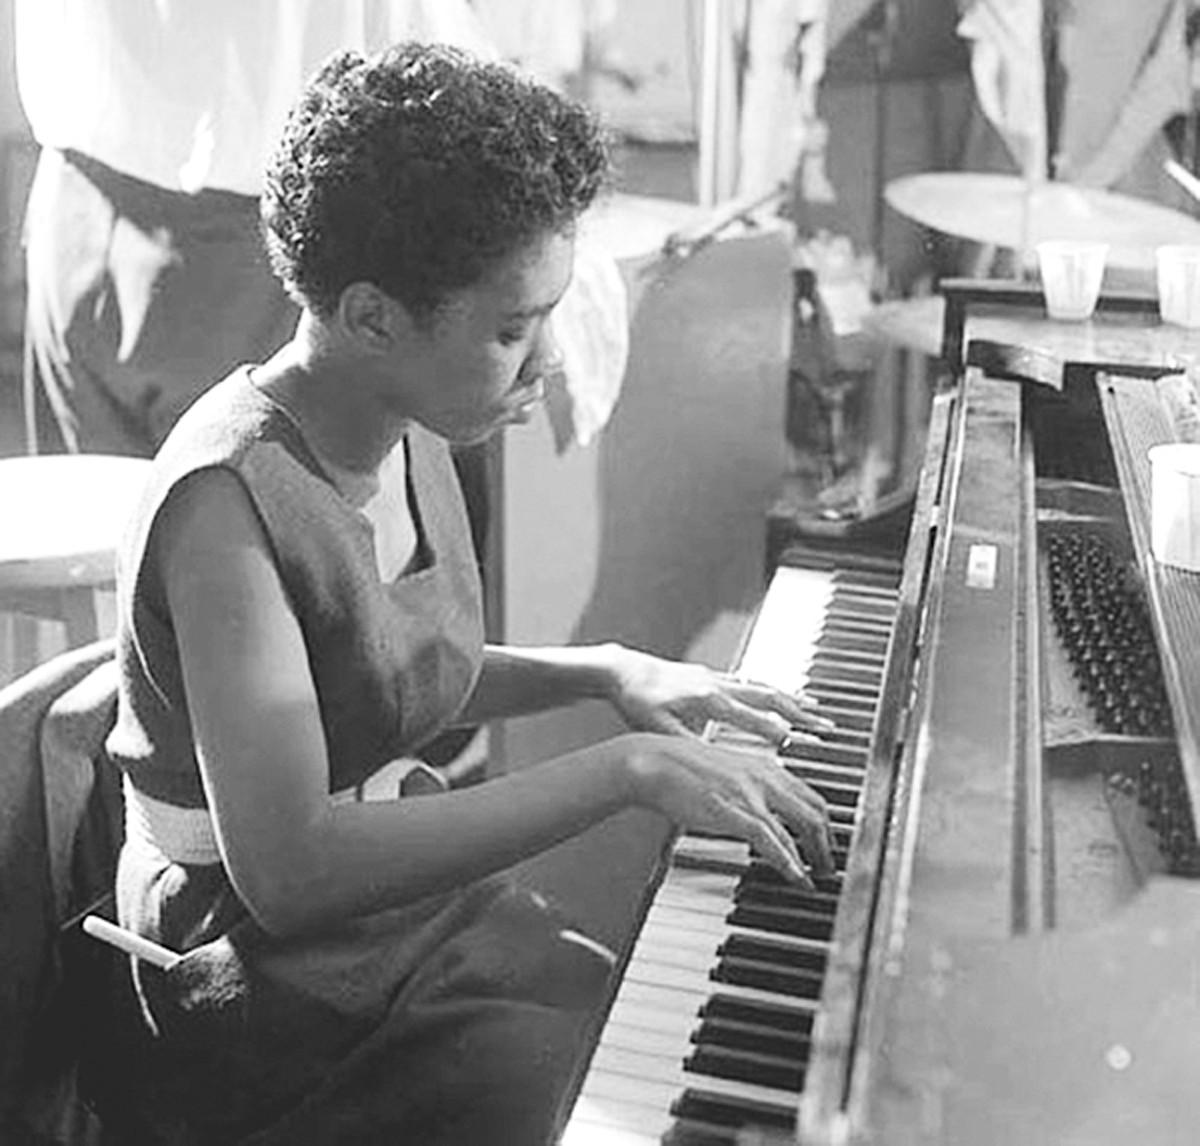 terry_pollard_-_nyc_1955_photo_by_herman_leonard.jpg